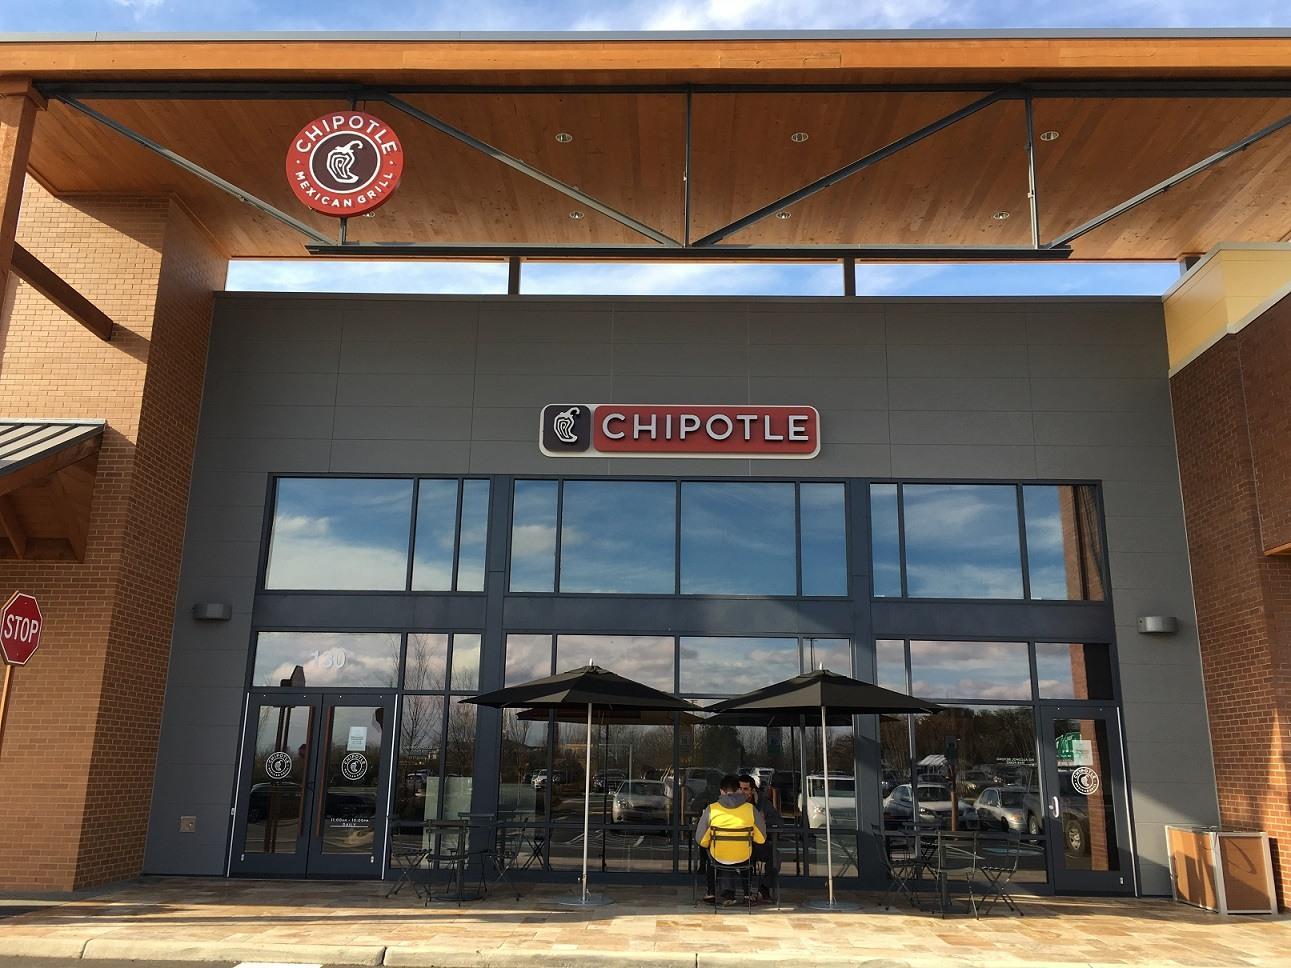 Chiptole-store-in-Ashburn-VA-CREDIT-Jim-Pierobon.jpg